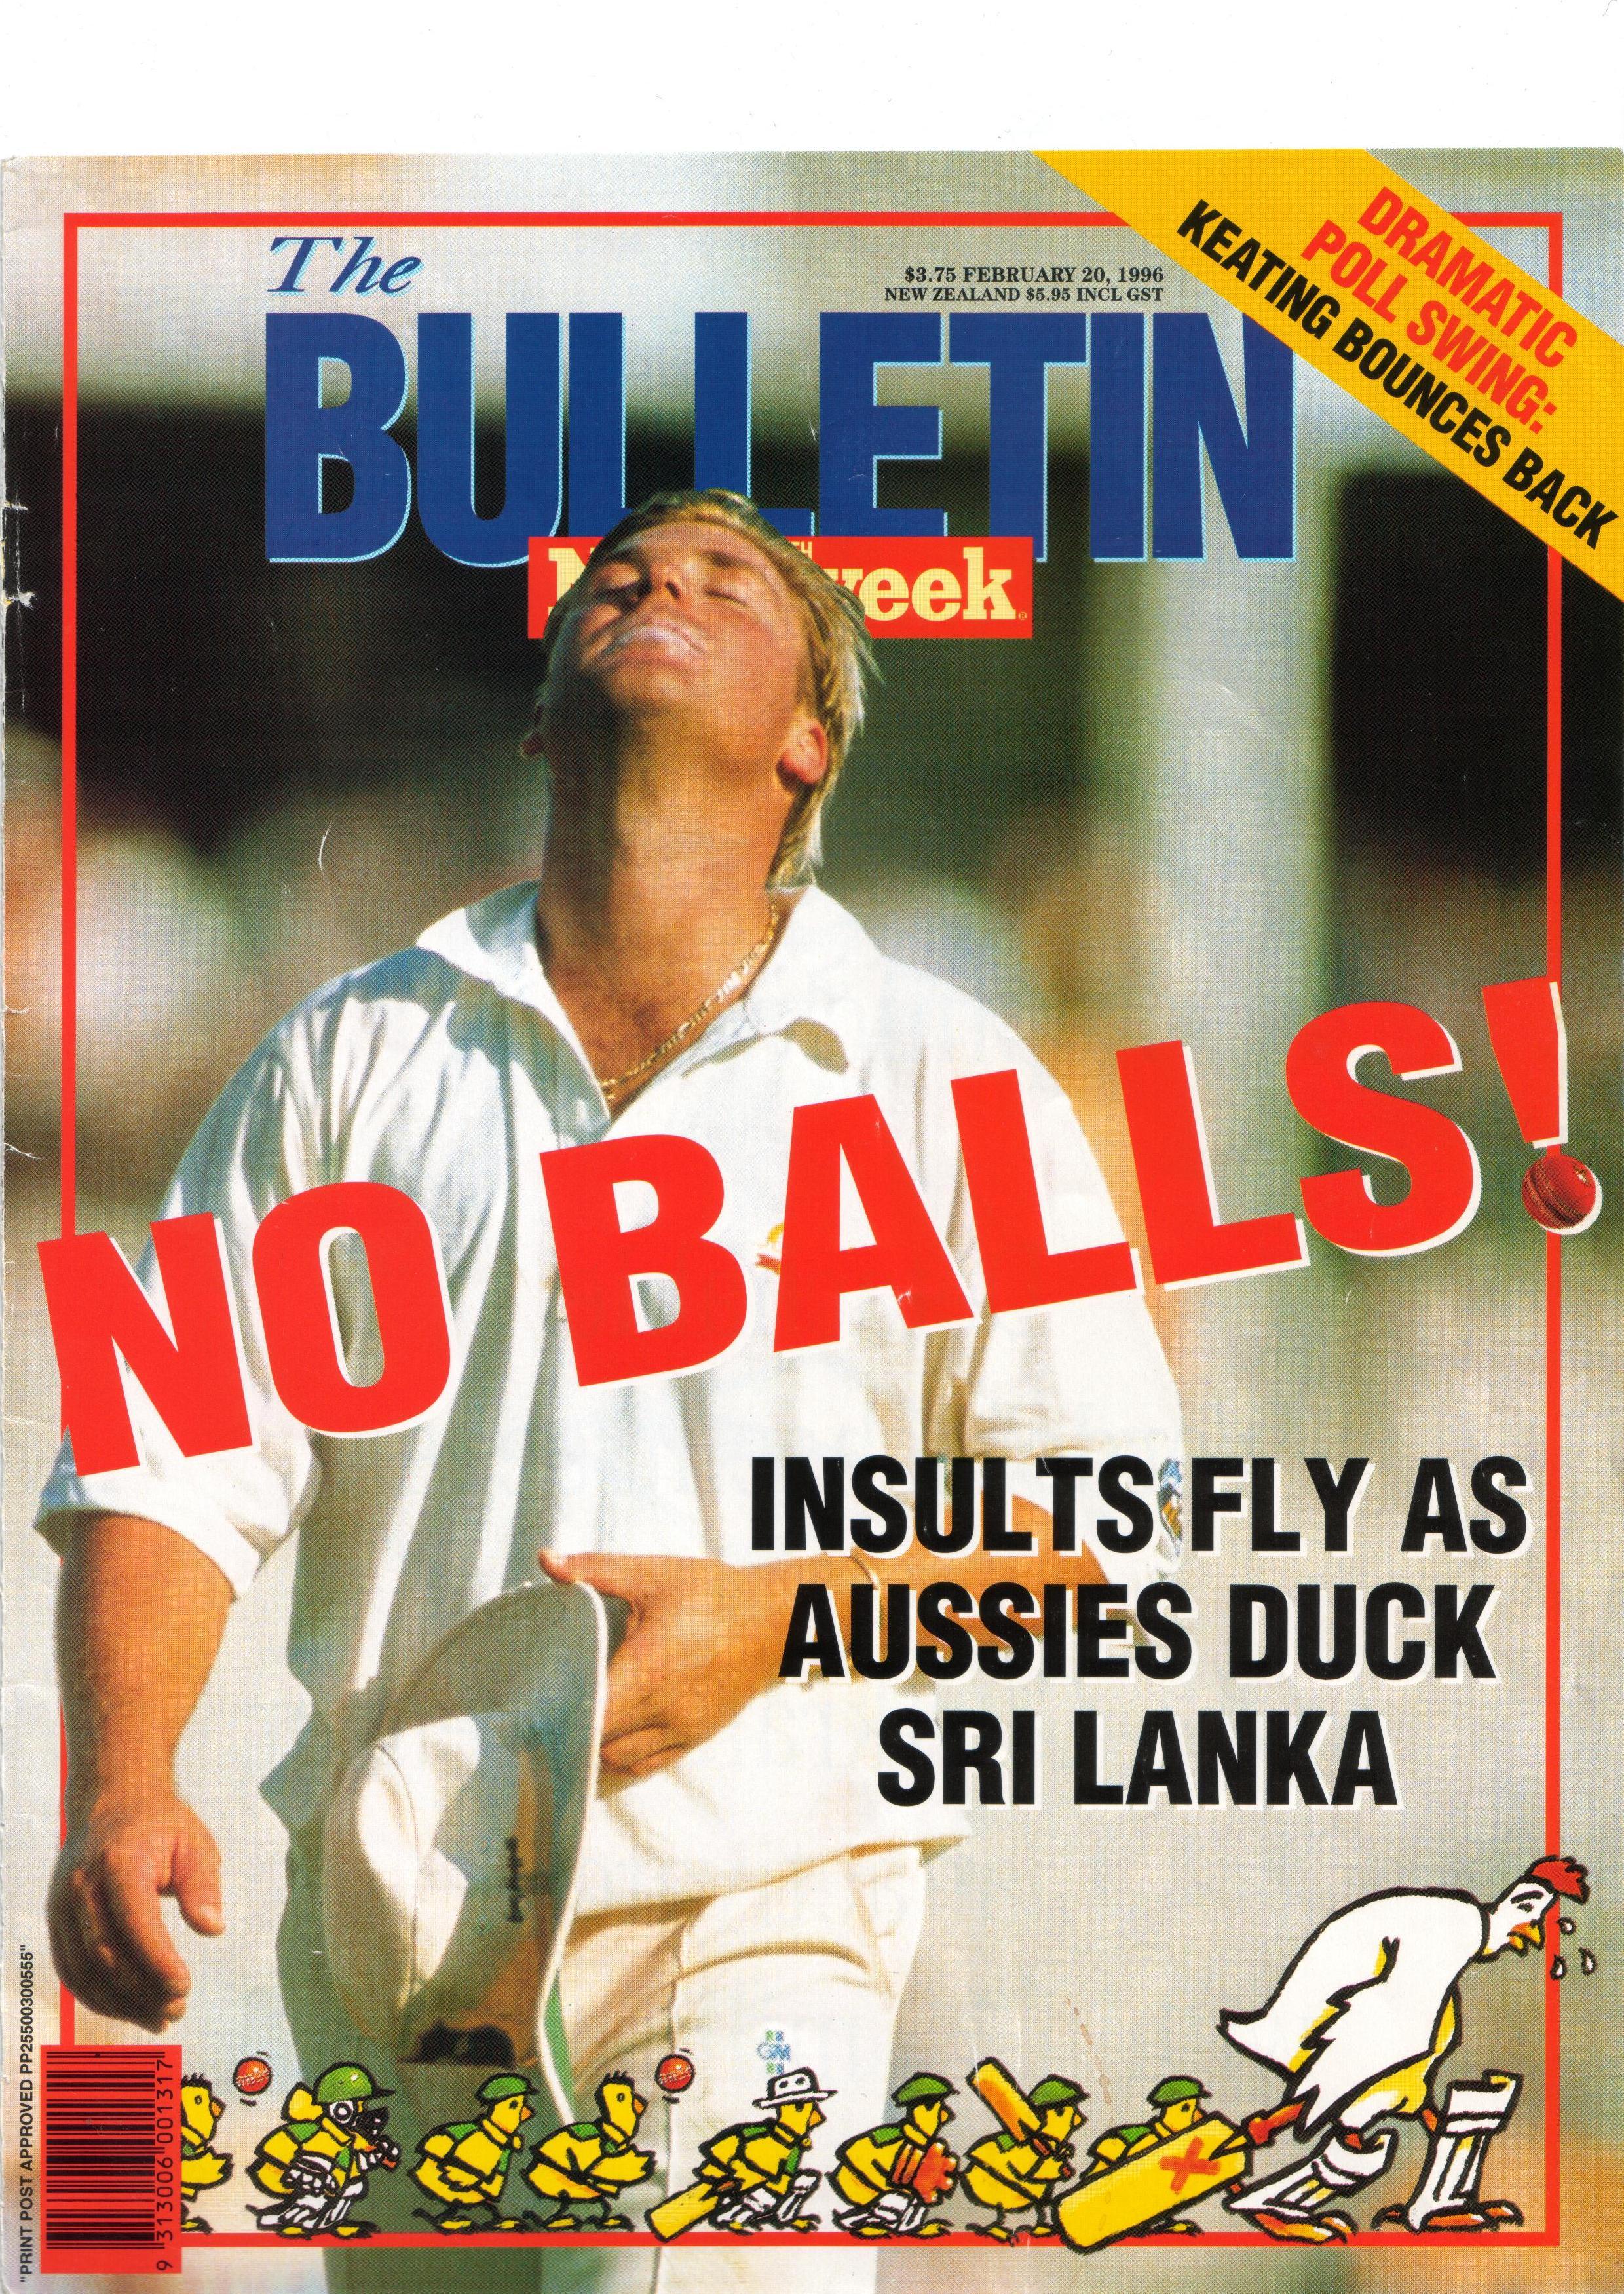 Essaying cricket sri lanka and beyond